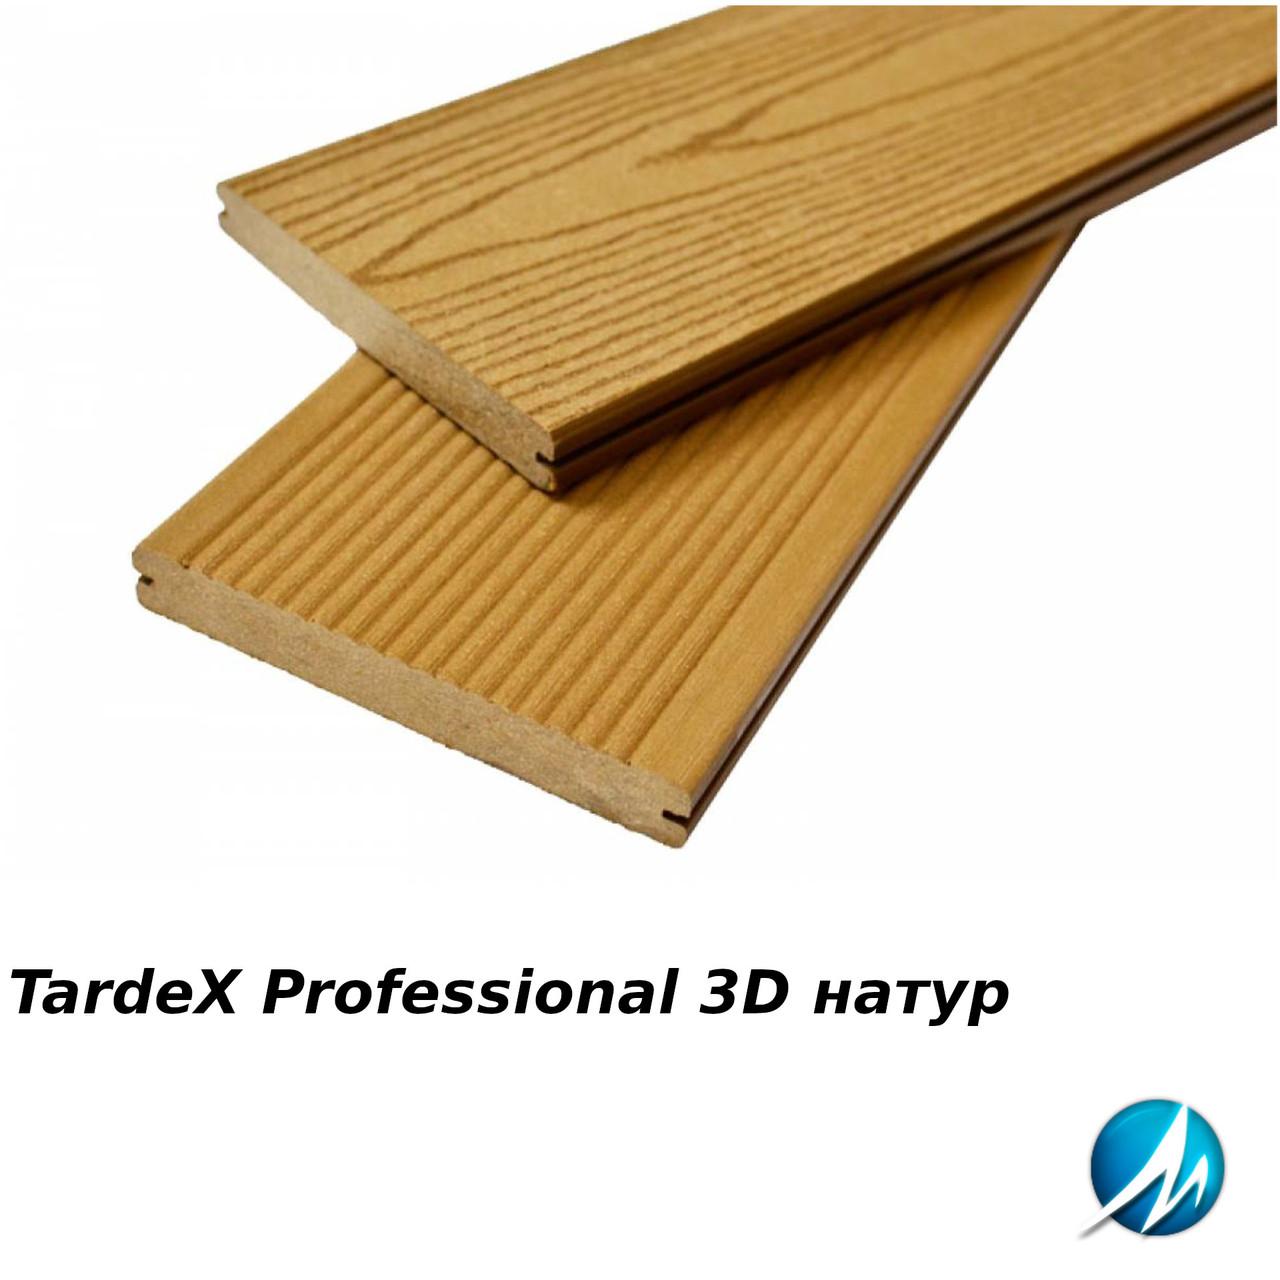 Терасна дошка TARDEX PROFESSIONAL 3D натур